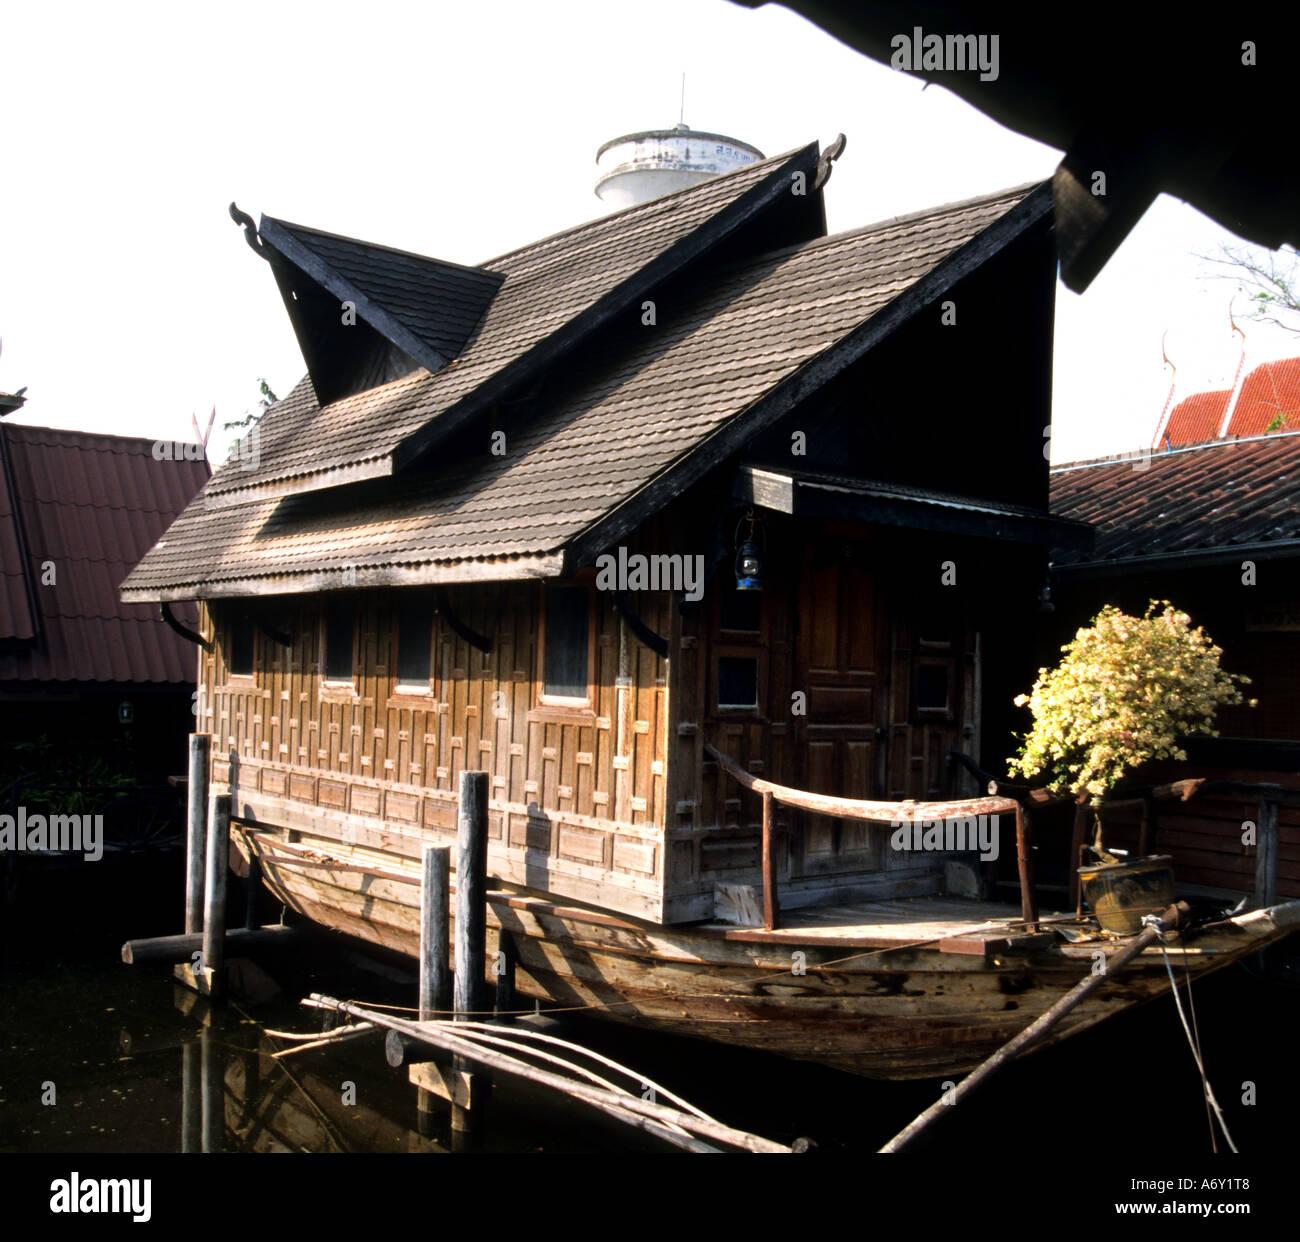 Chalet, cabane, chalet igloo Thaïlande Thai Asie Asie de l ...